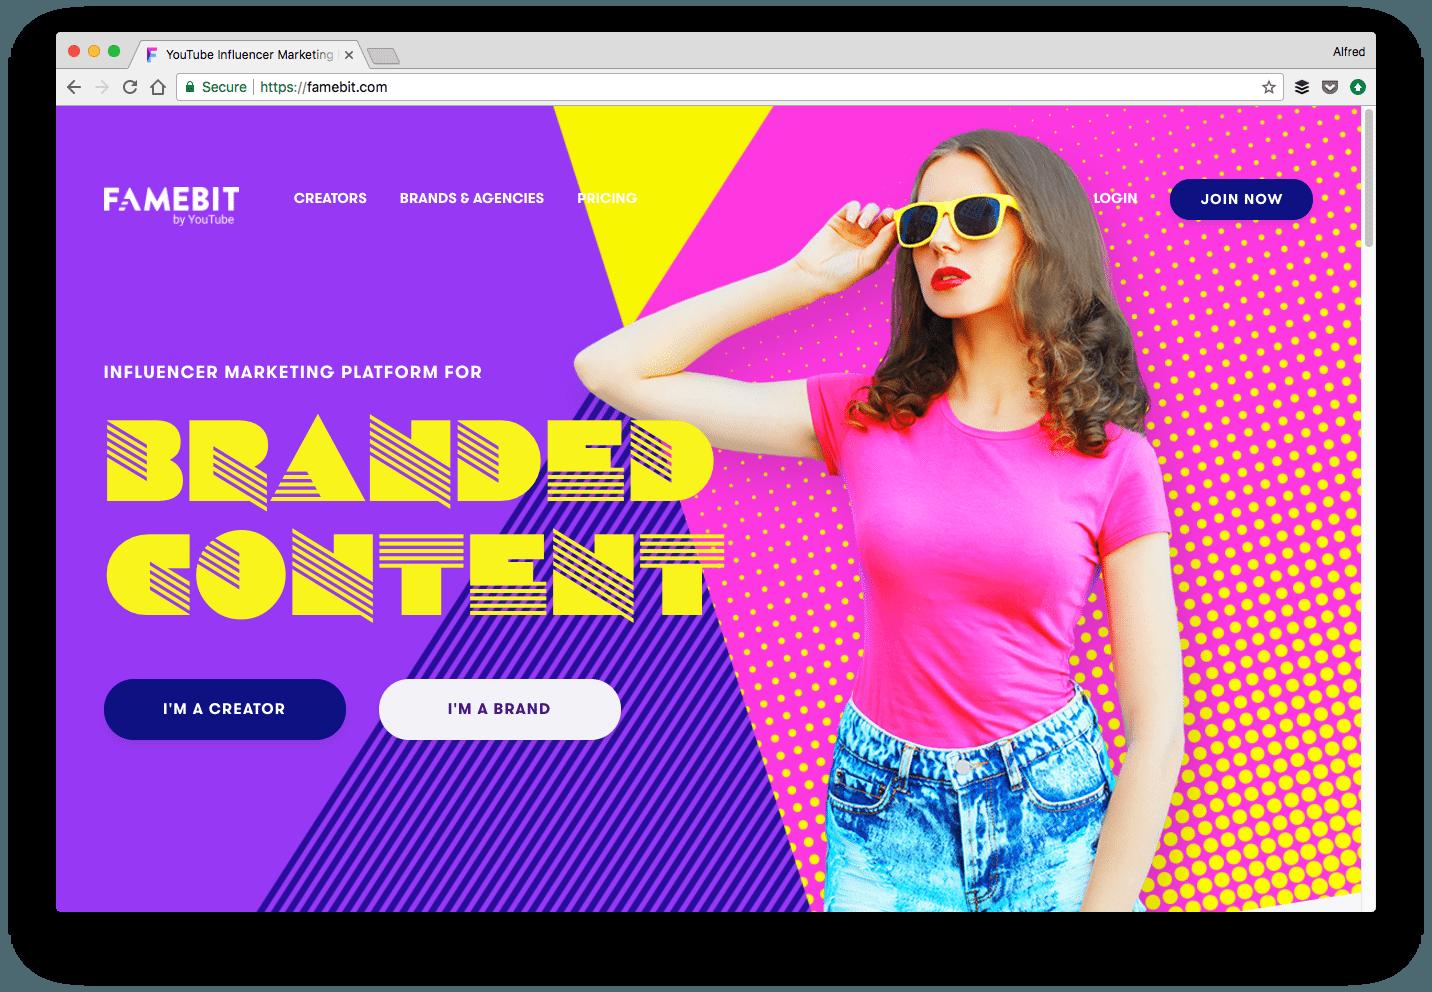 Influencer marketing platform - Famebit